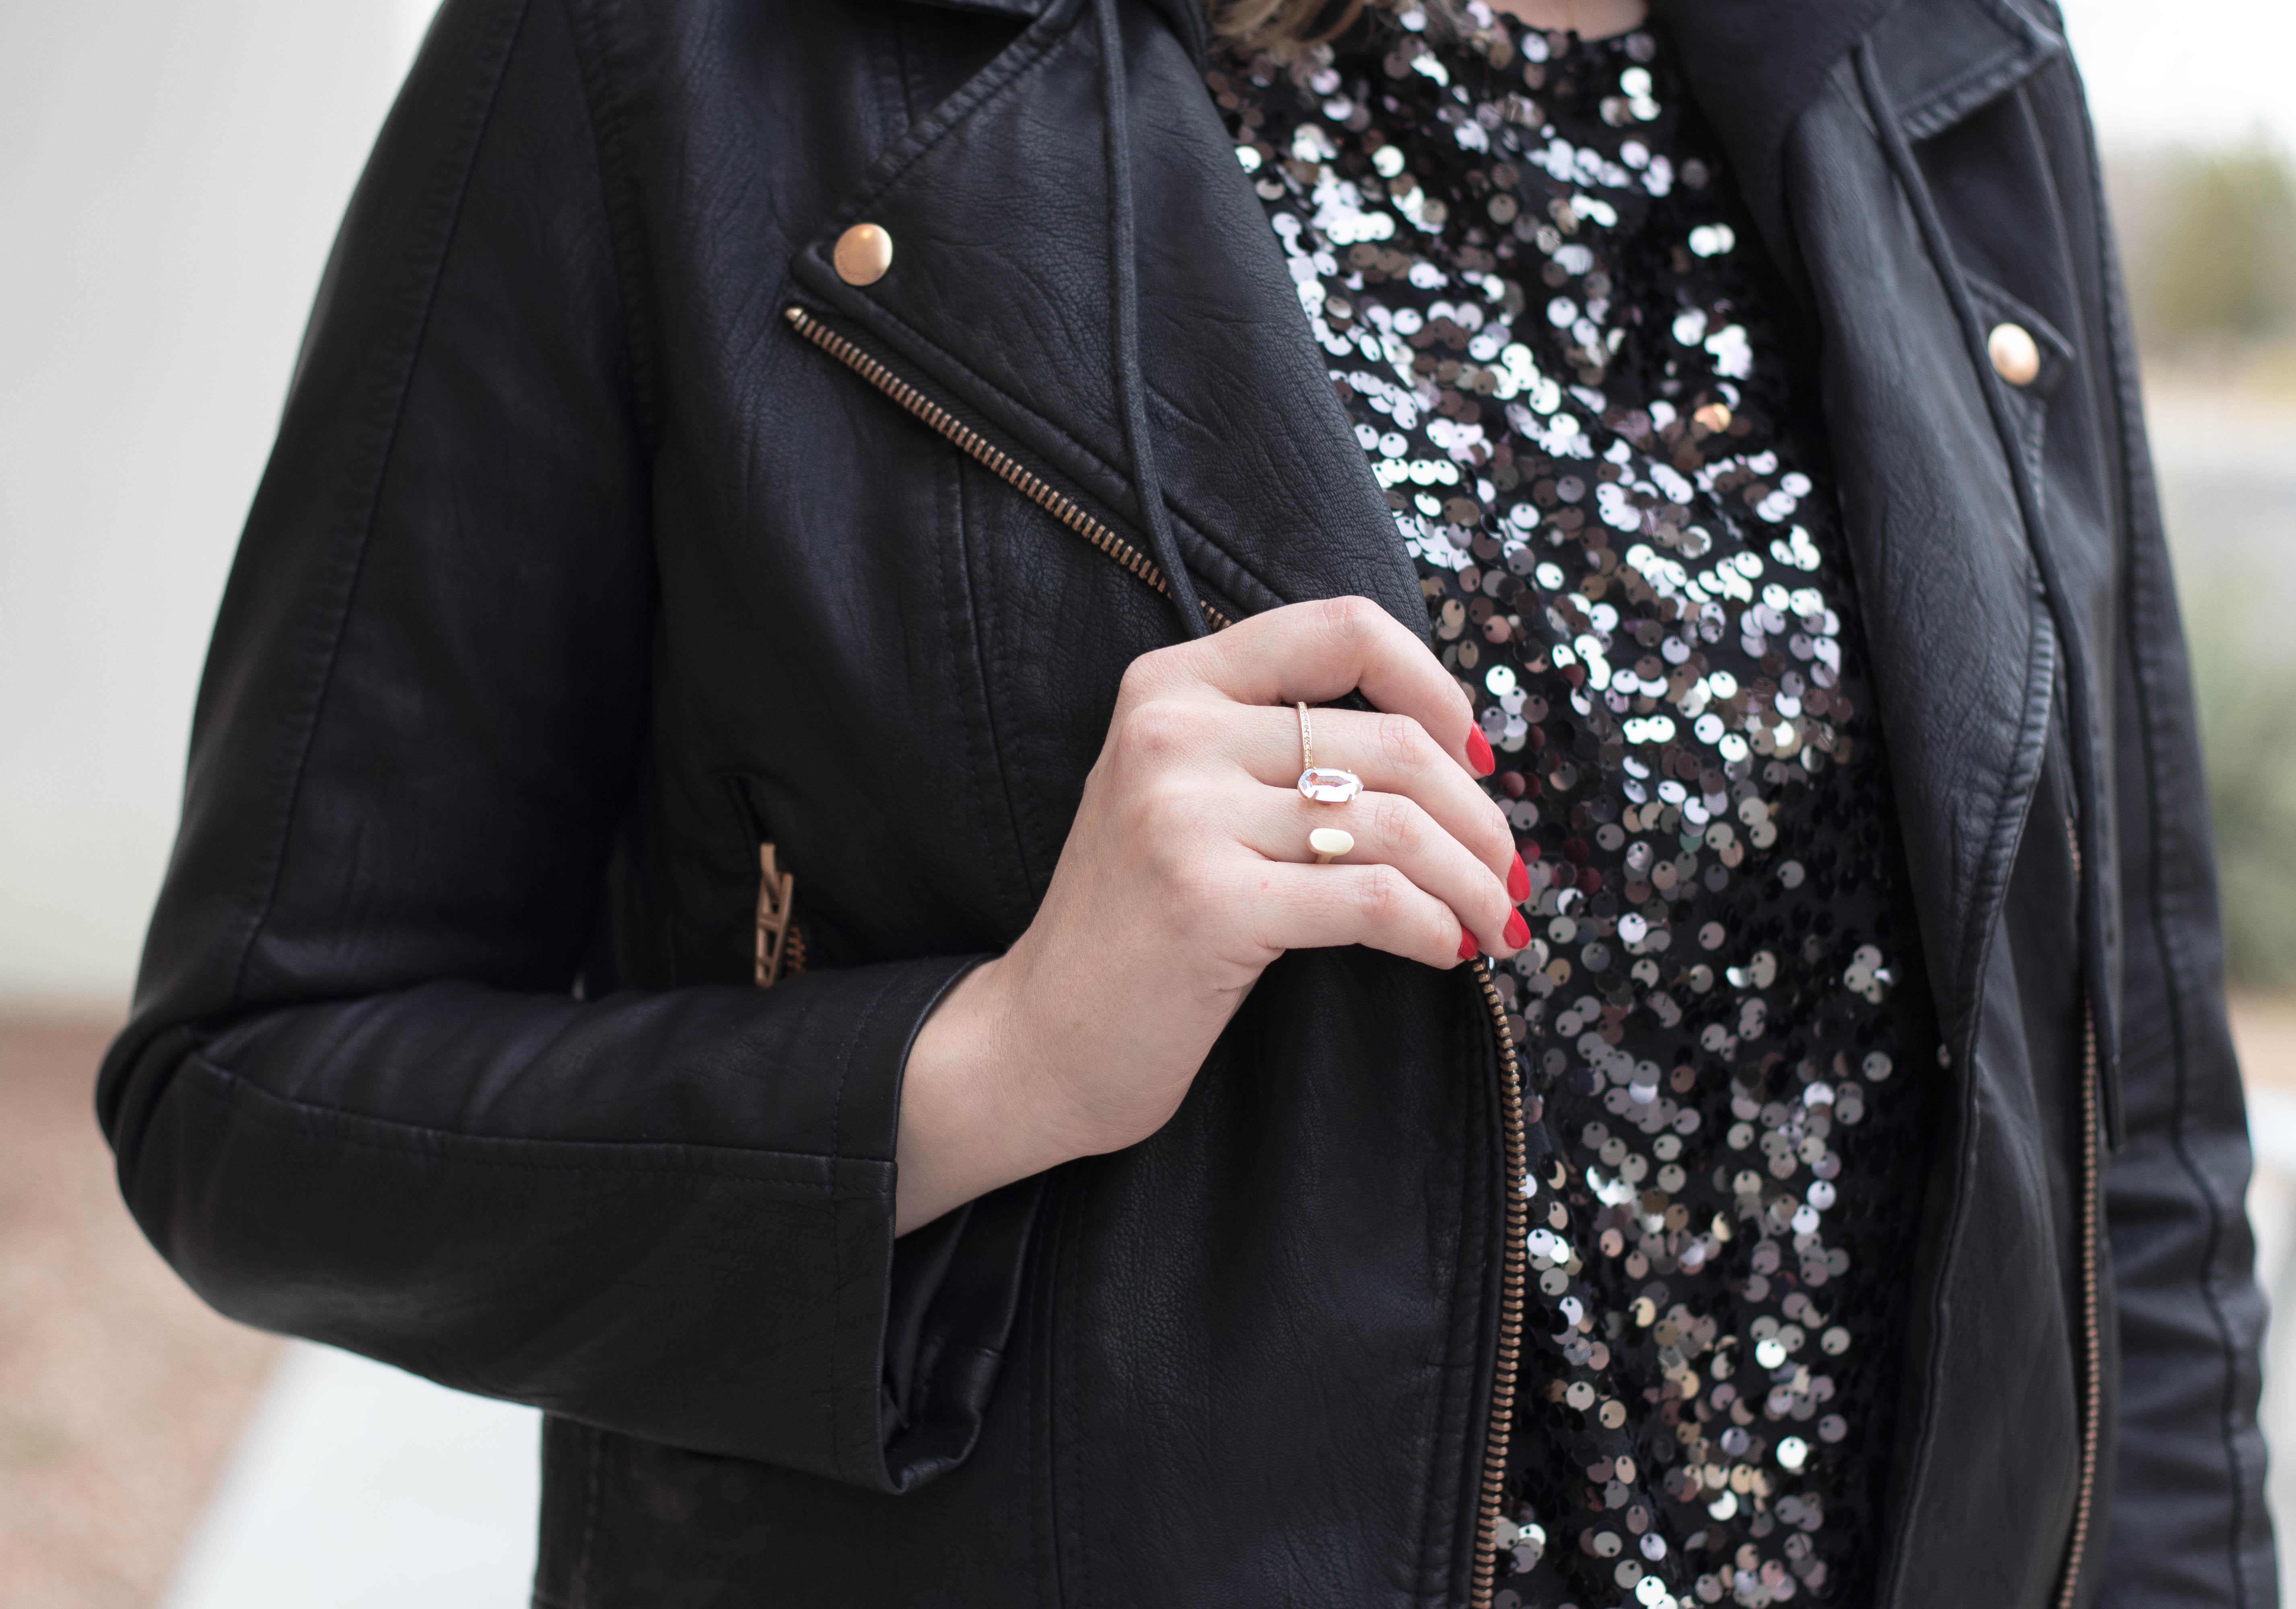 Kendra Scott statement ring #kendrascott #sequintop #leatherjacket